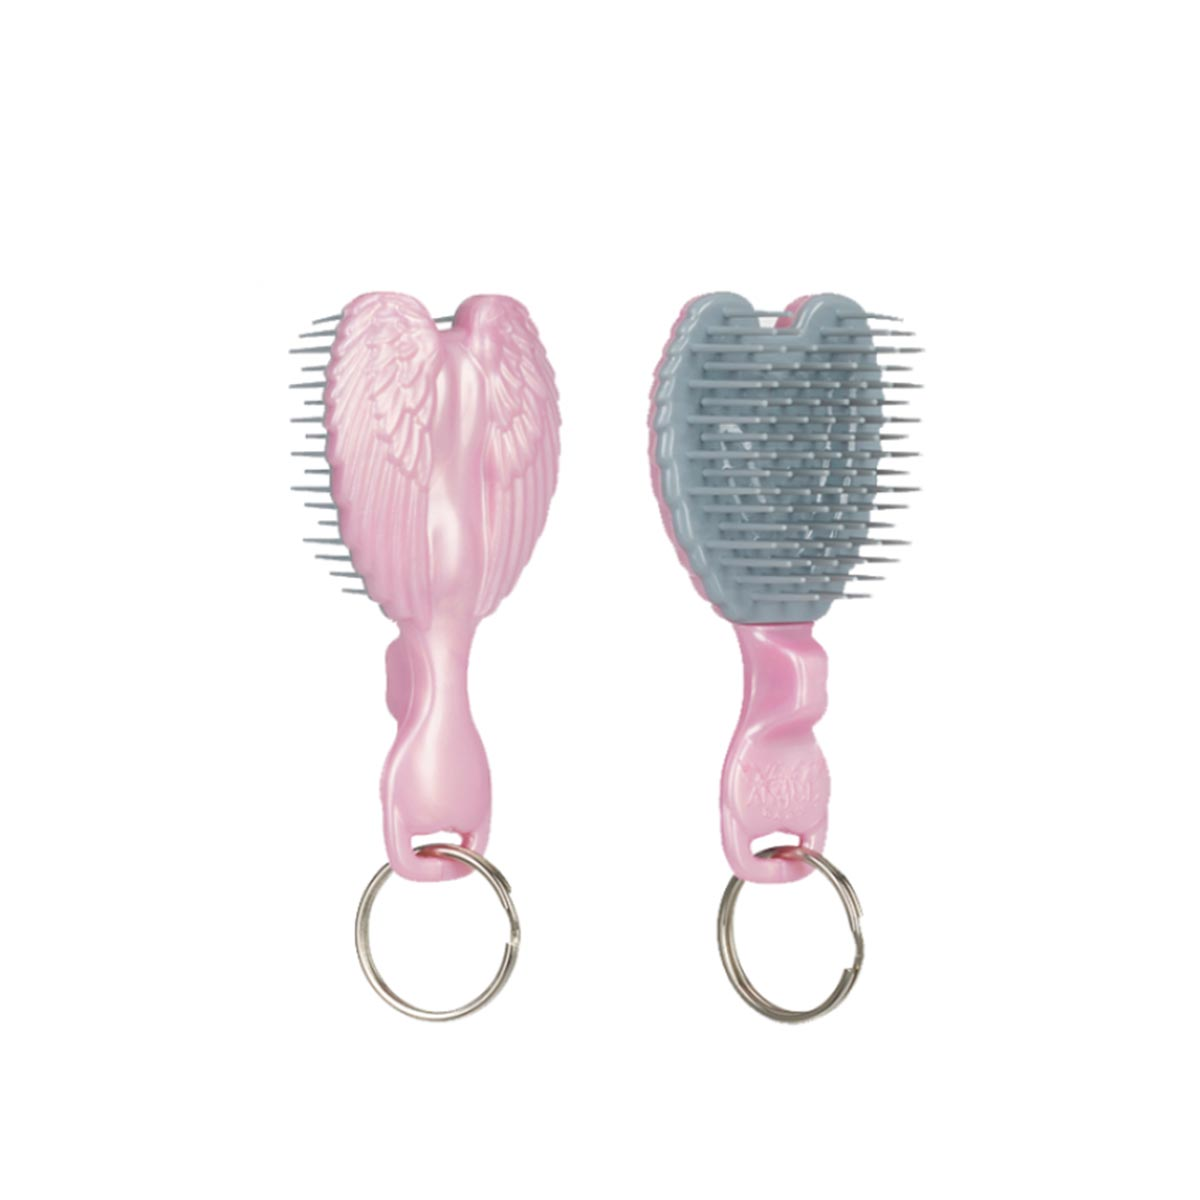 【新品上市】Tangle Angel 瀏海乖乖梳(粉色) Key Ring Pink